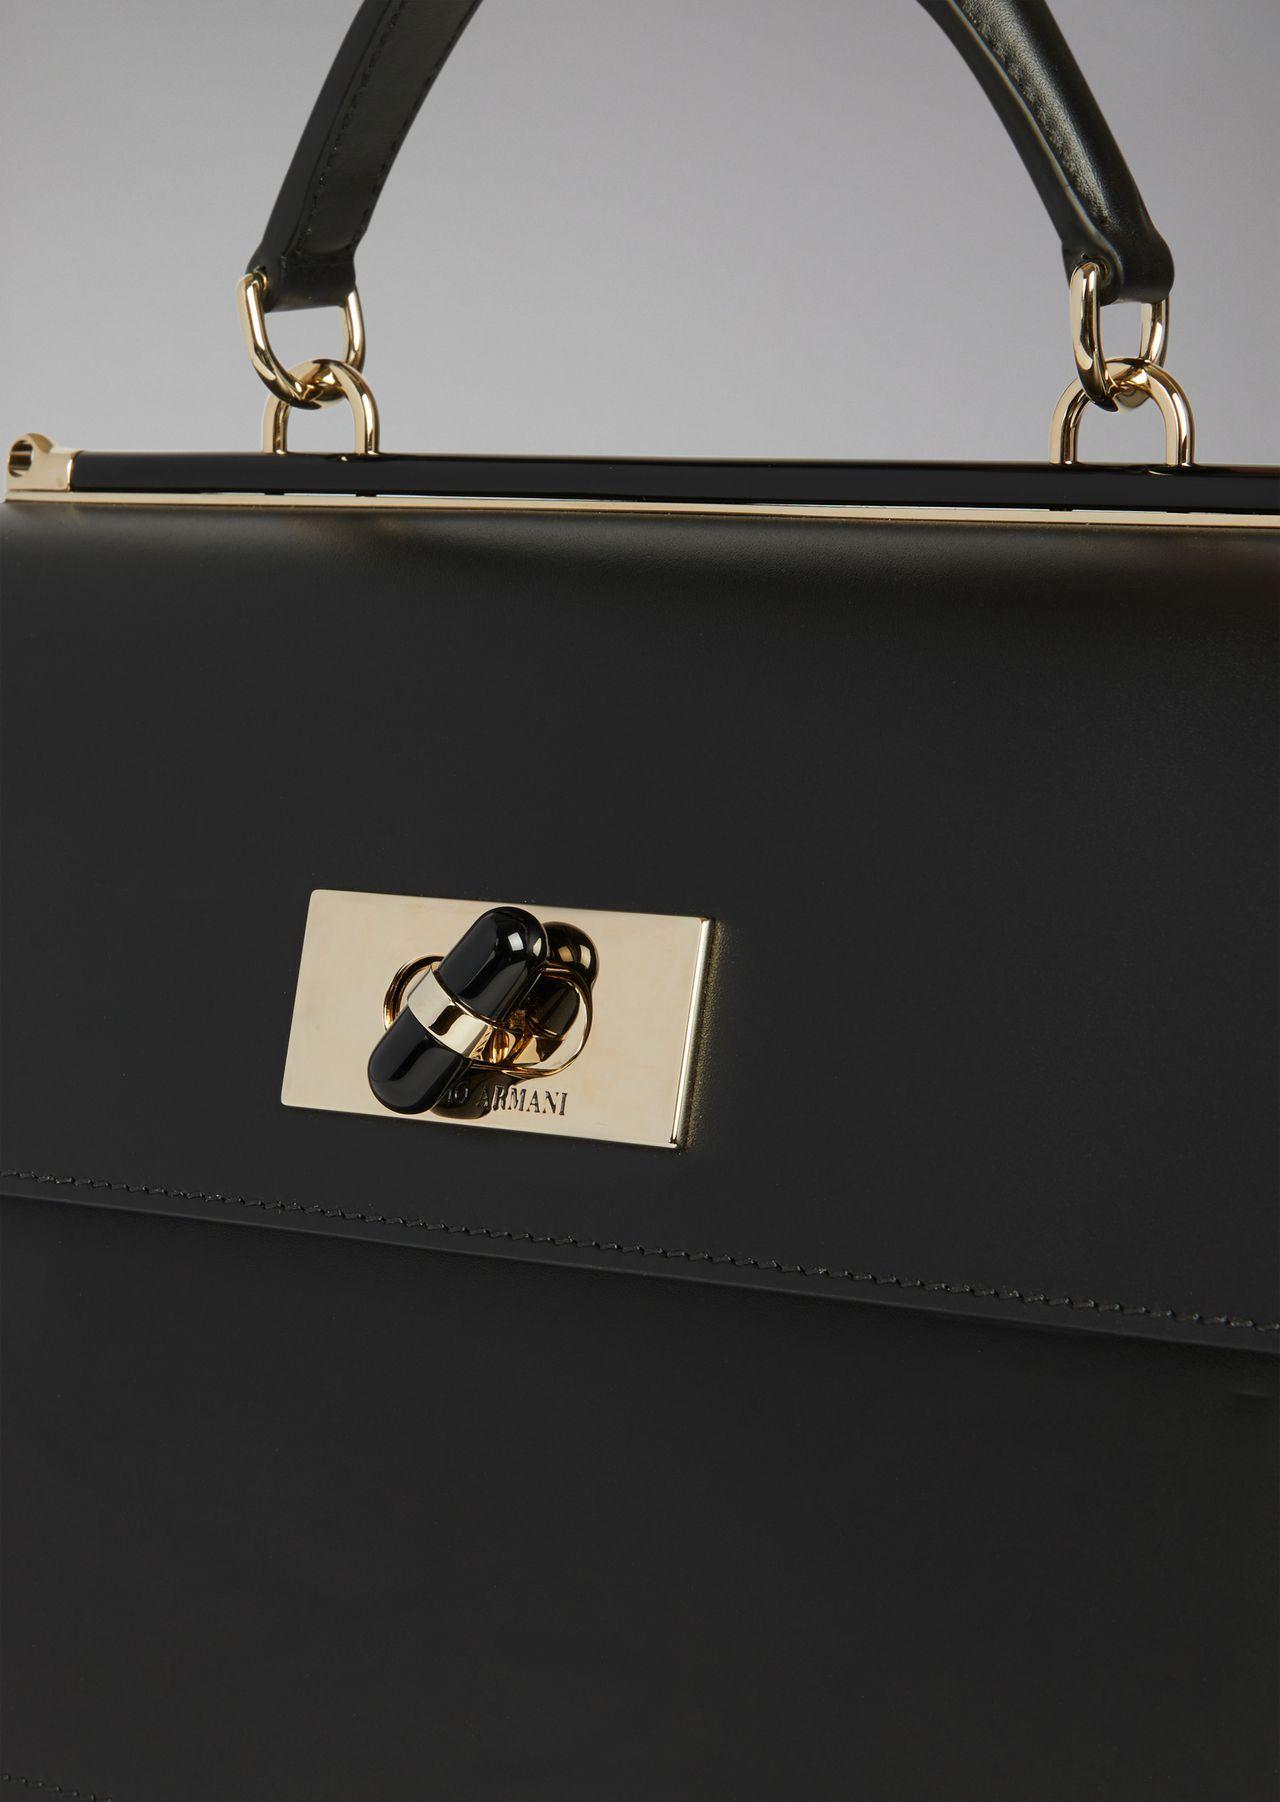 6c3a8d0bb1 Giorgio Armani Borgonuovo 11 Smooth Leather Handbag With Plexiglass ...